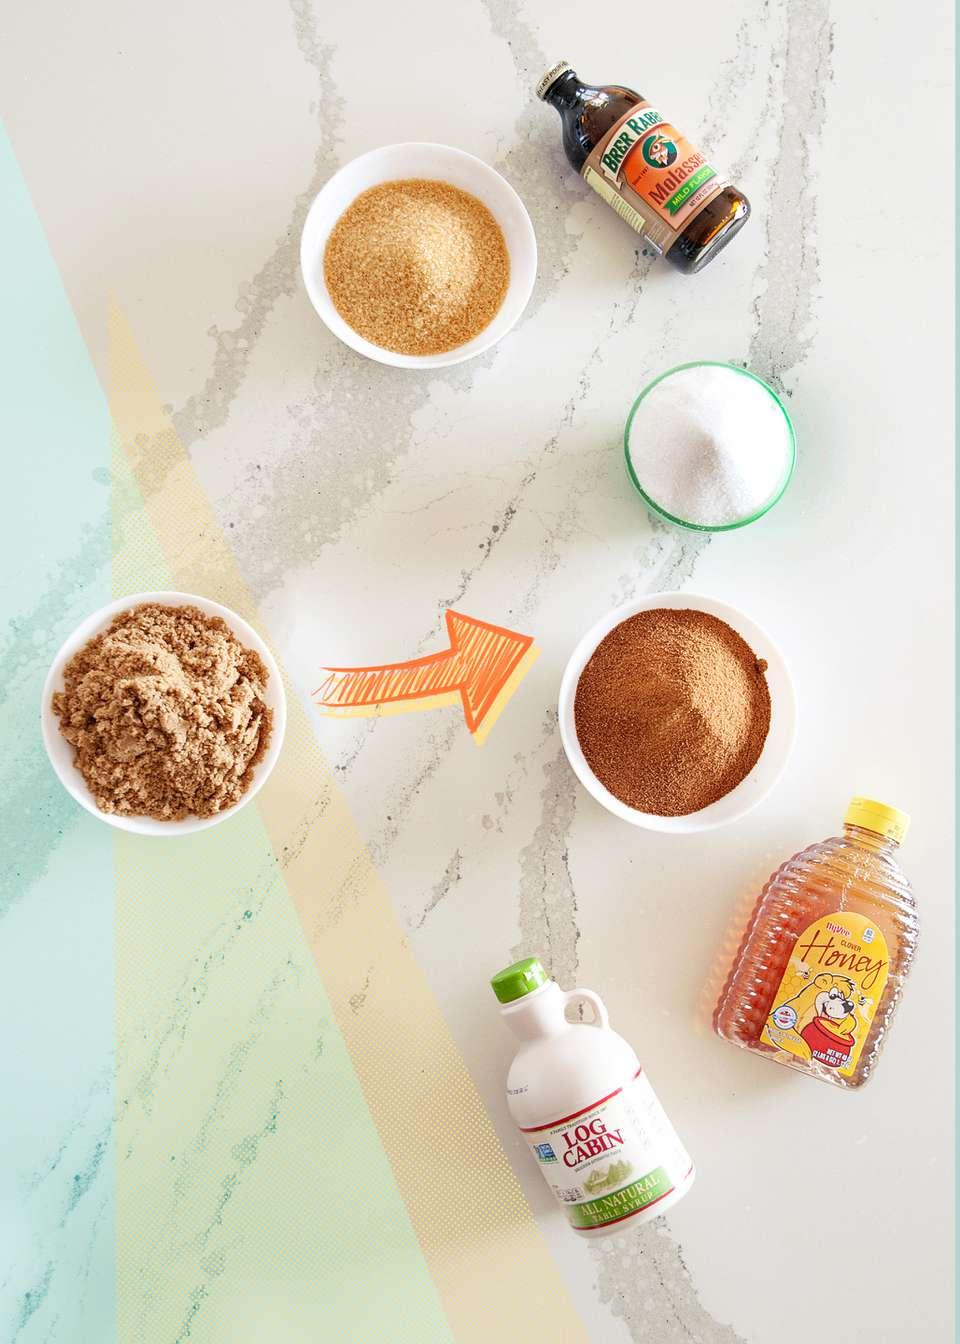 Brown sugar substitutes